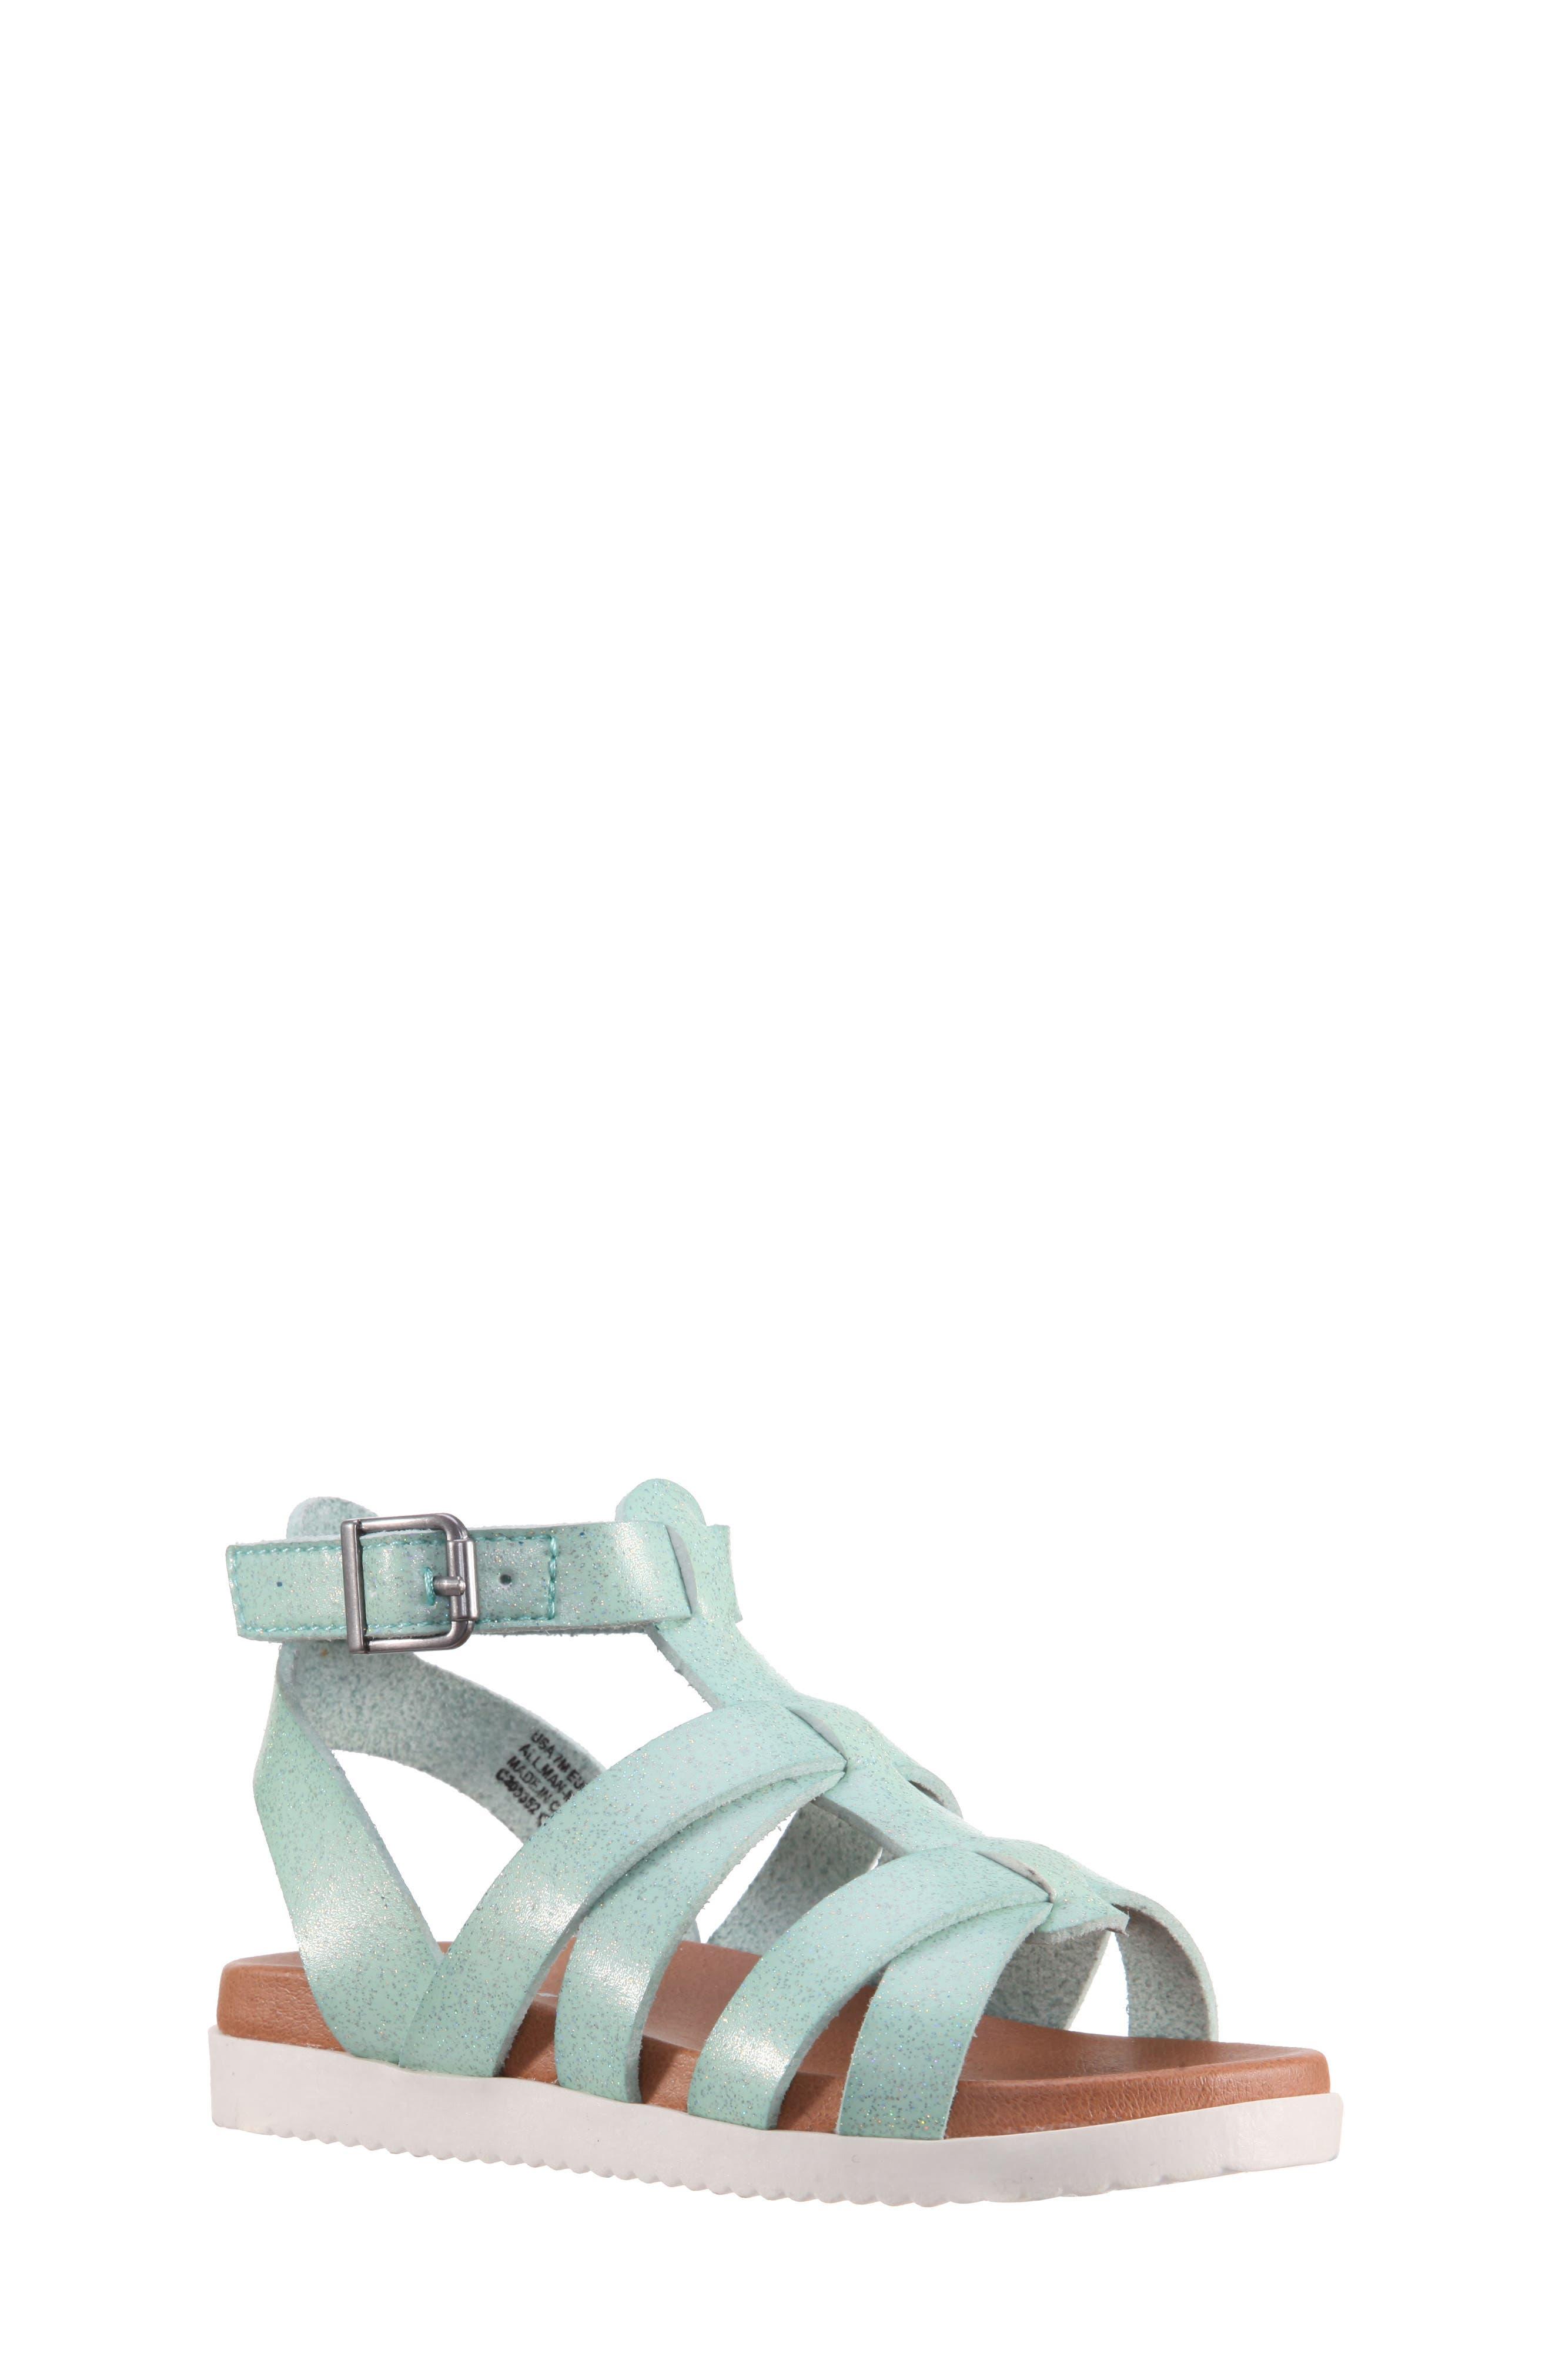 Alpha Gladiator Sandal,                             Main thumbnail 1, color,                             Mint Dip Dye